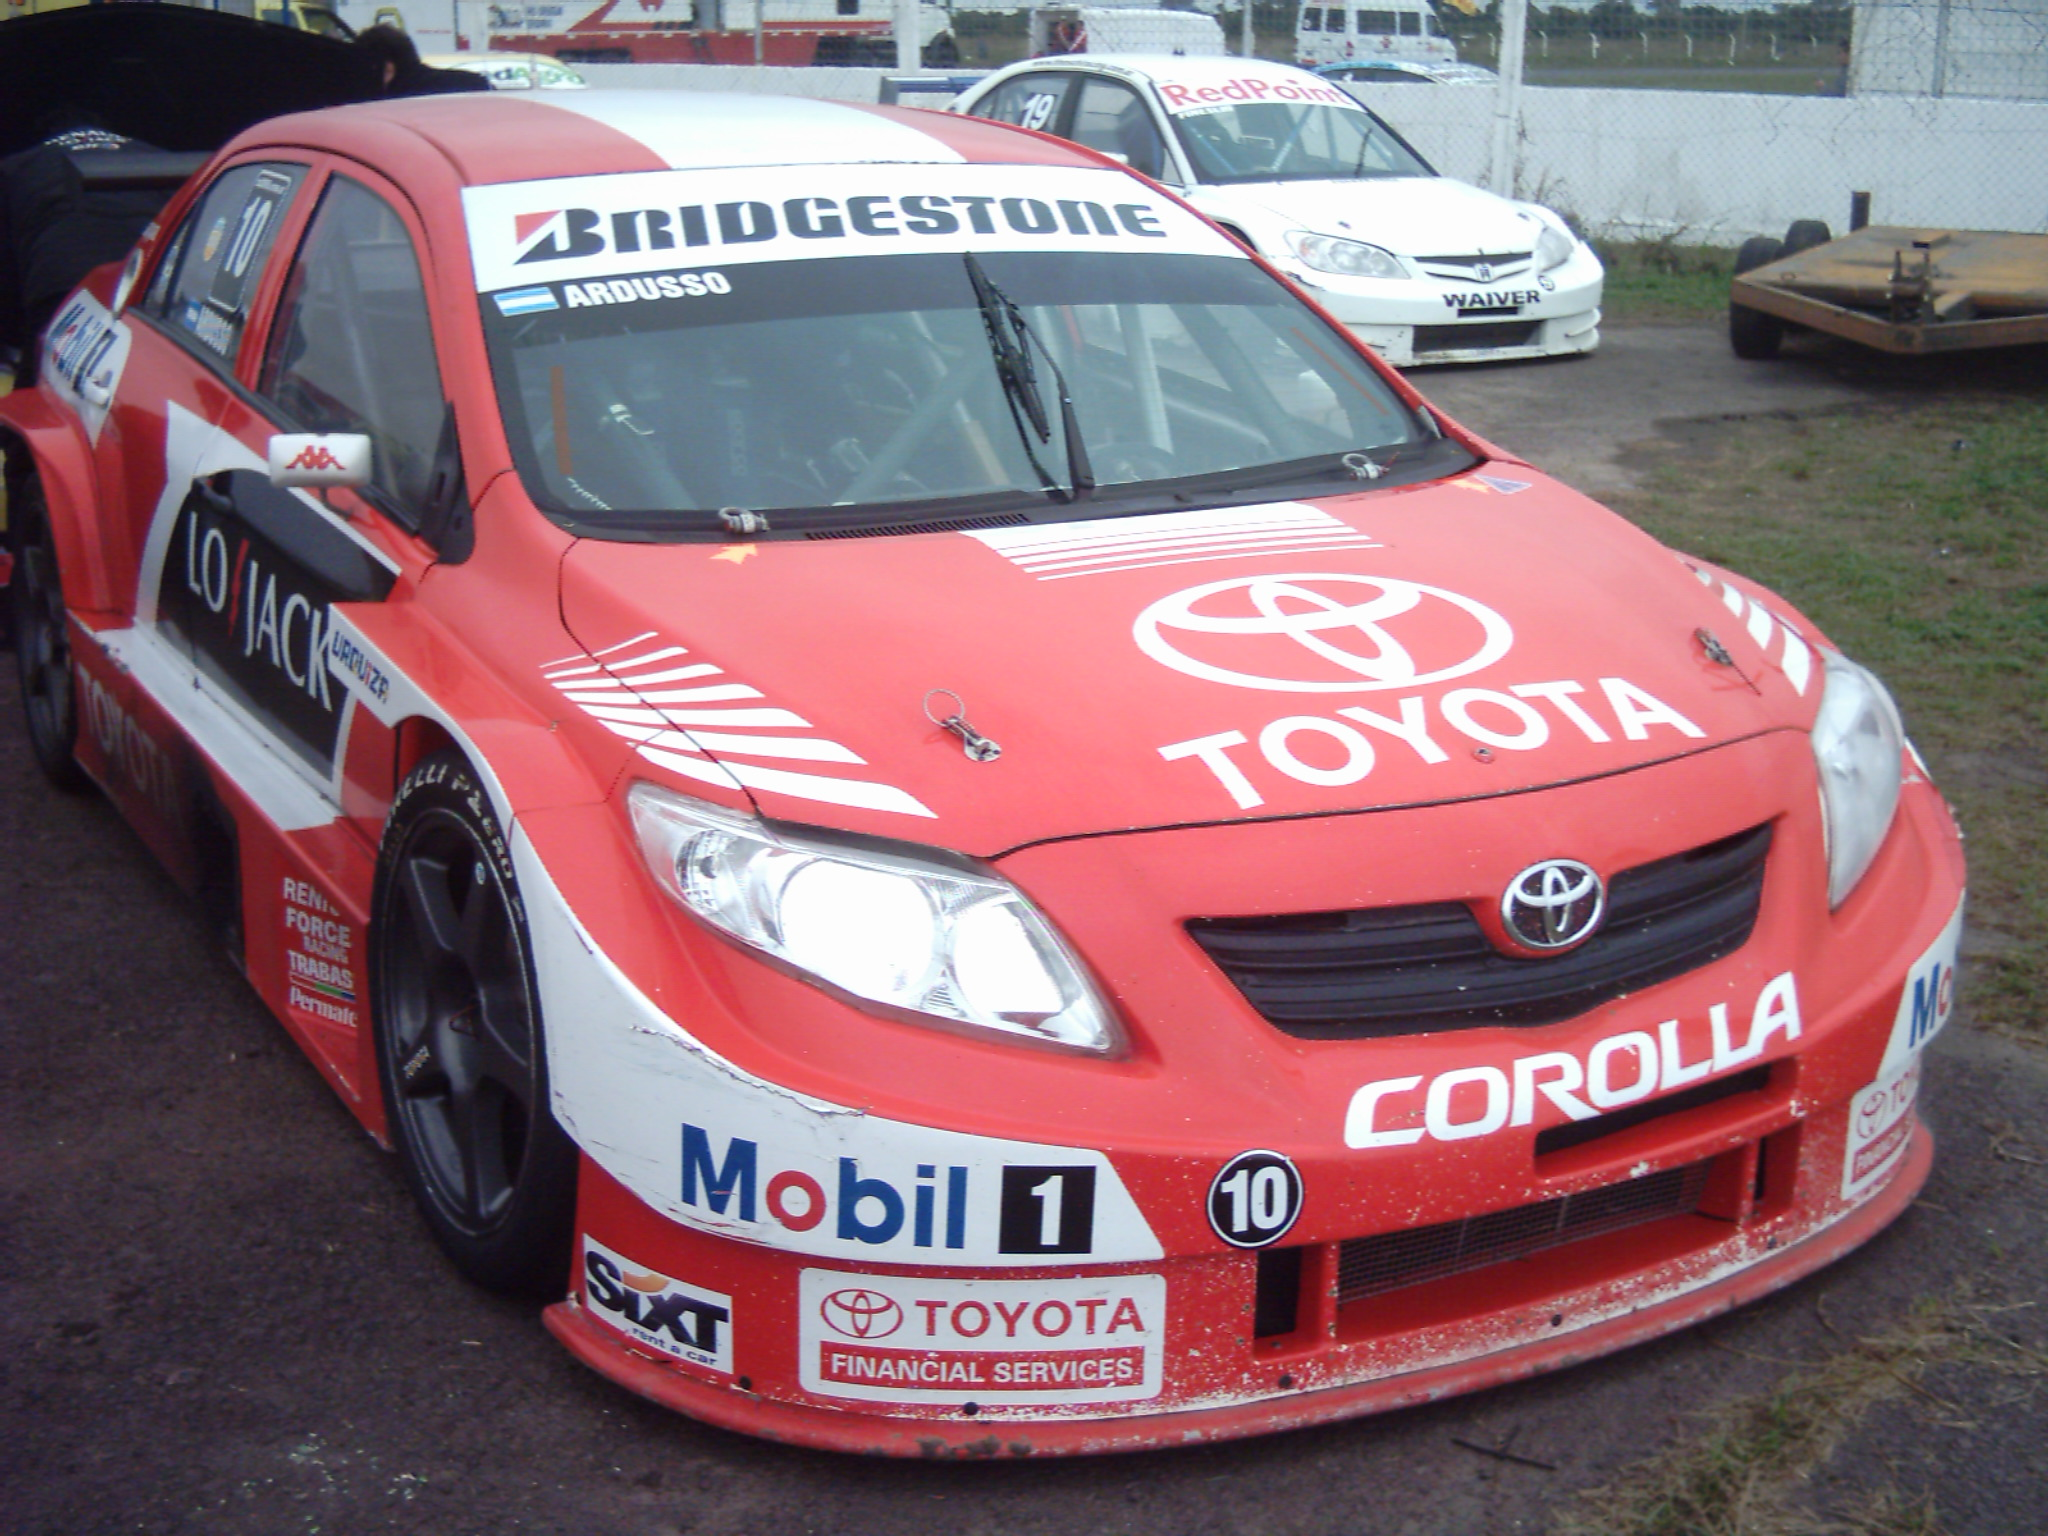 File:TC 2000 Toyota Corolla 2010 JPG - Wikimedia Commons